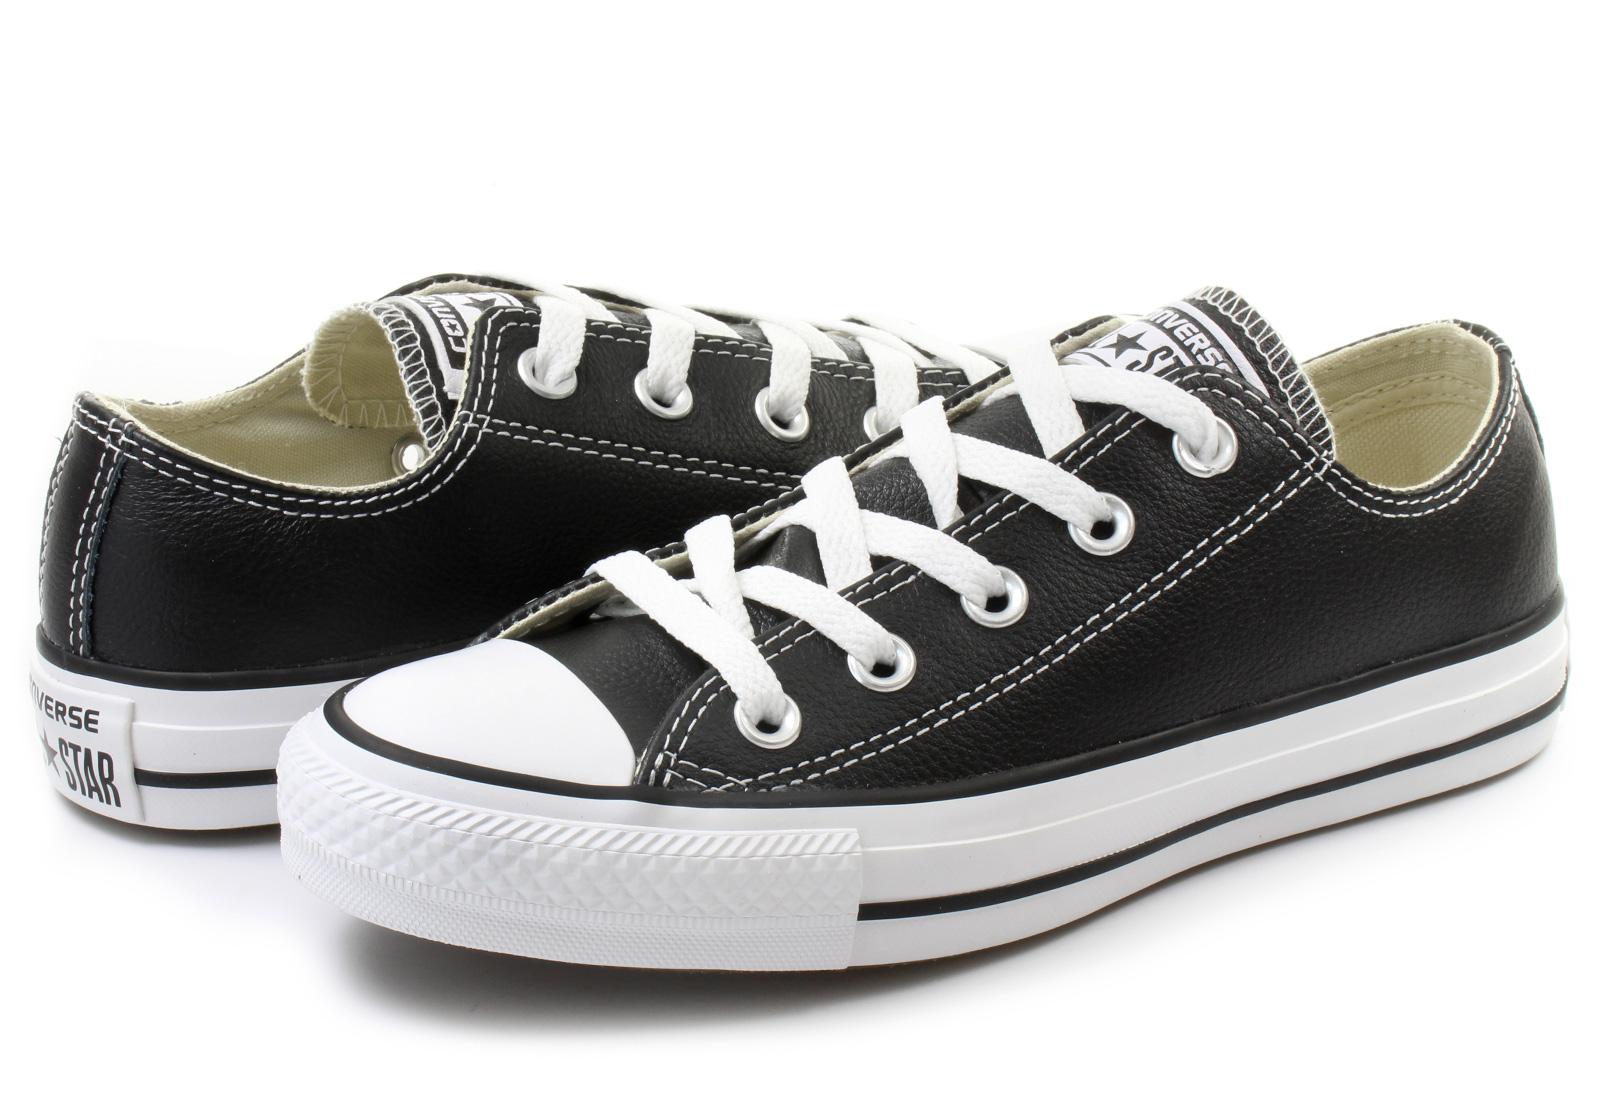 302ea3e955608 Converse Trampki - Ct As Core Leather Ox - 132174C - Obuwie i buty ...